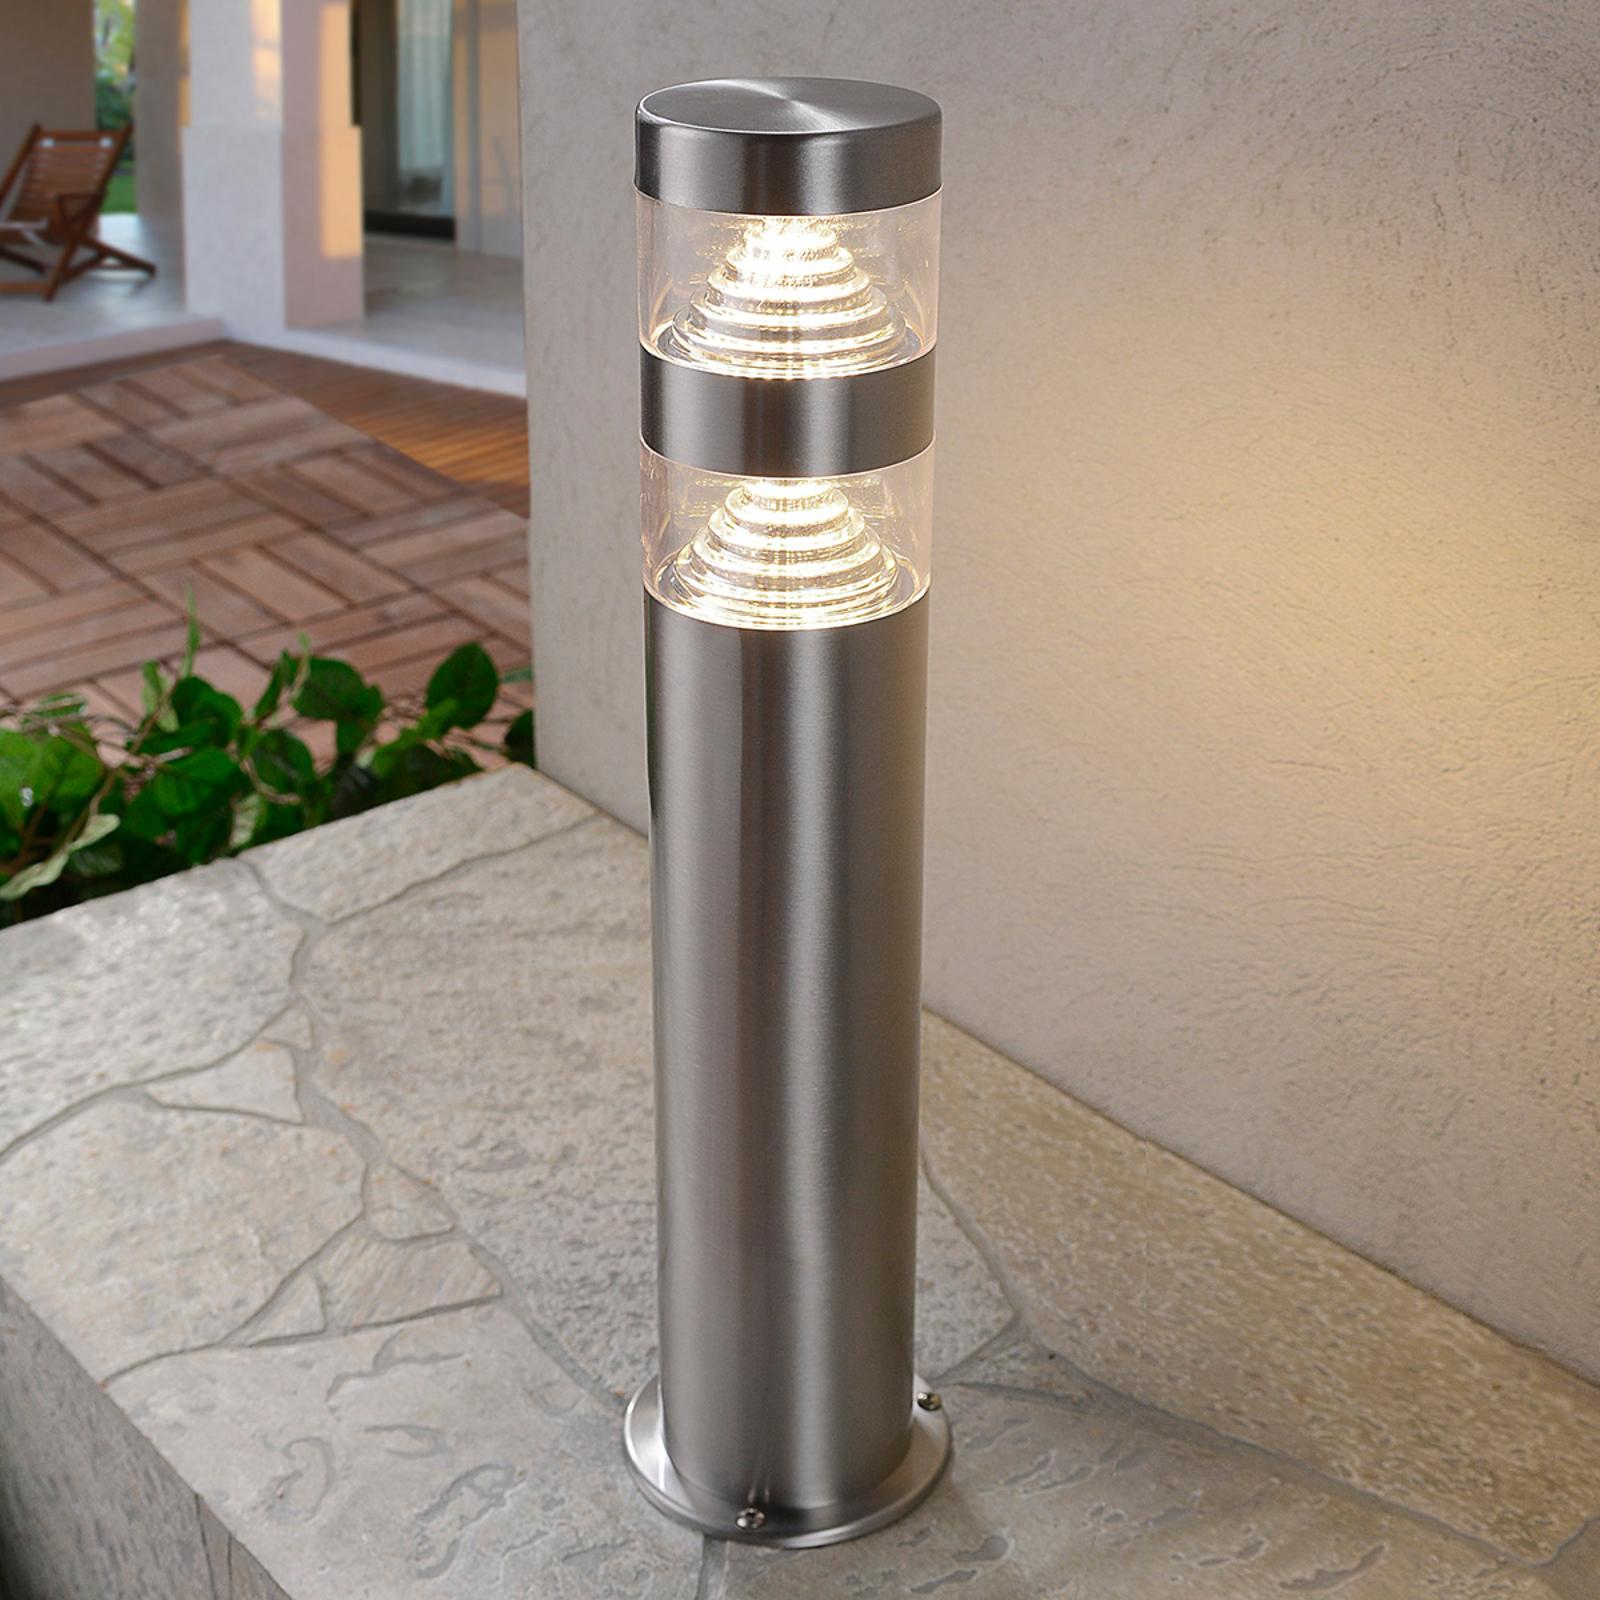 Lanea - LED-sokkellampe i rustfritt stål, 40cm